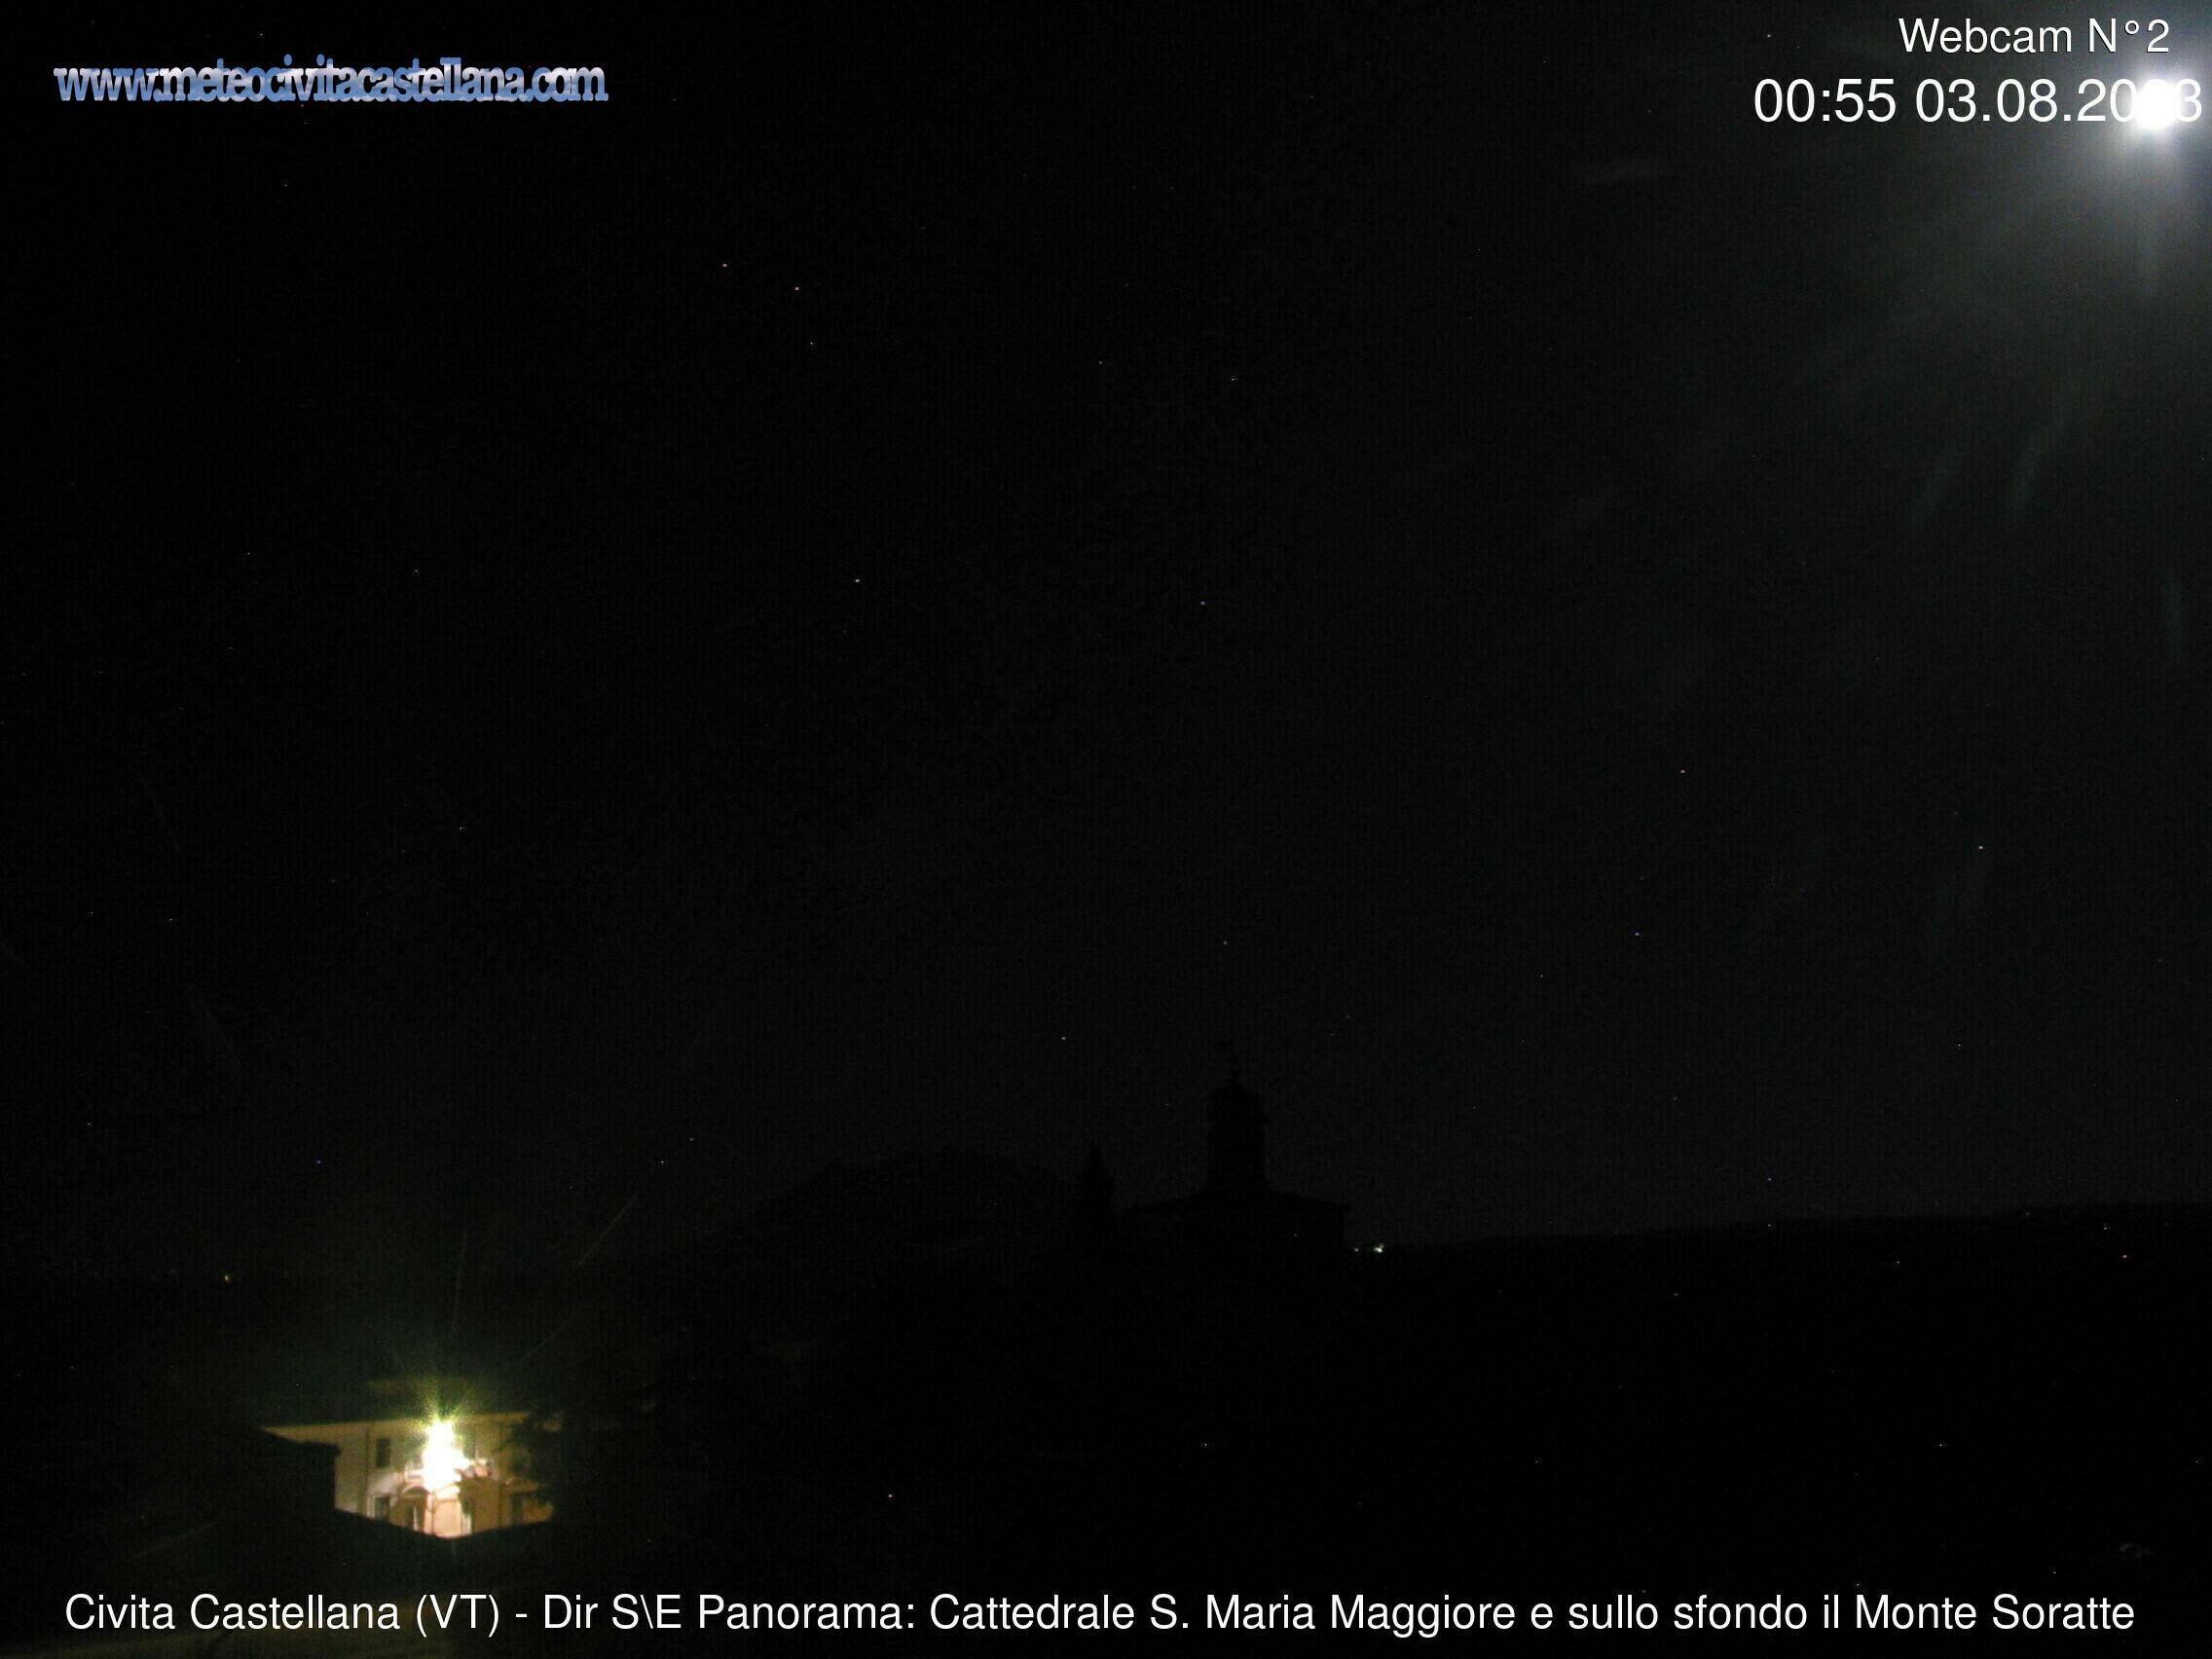 Civita Castellana Sat. 00:58